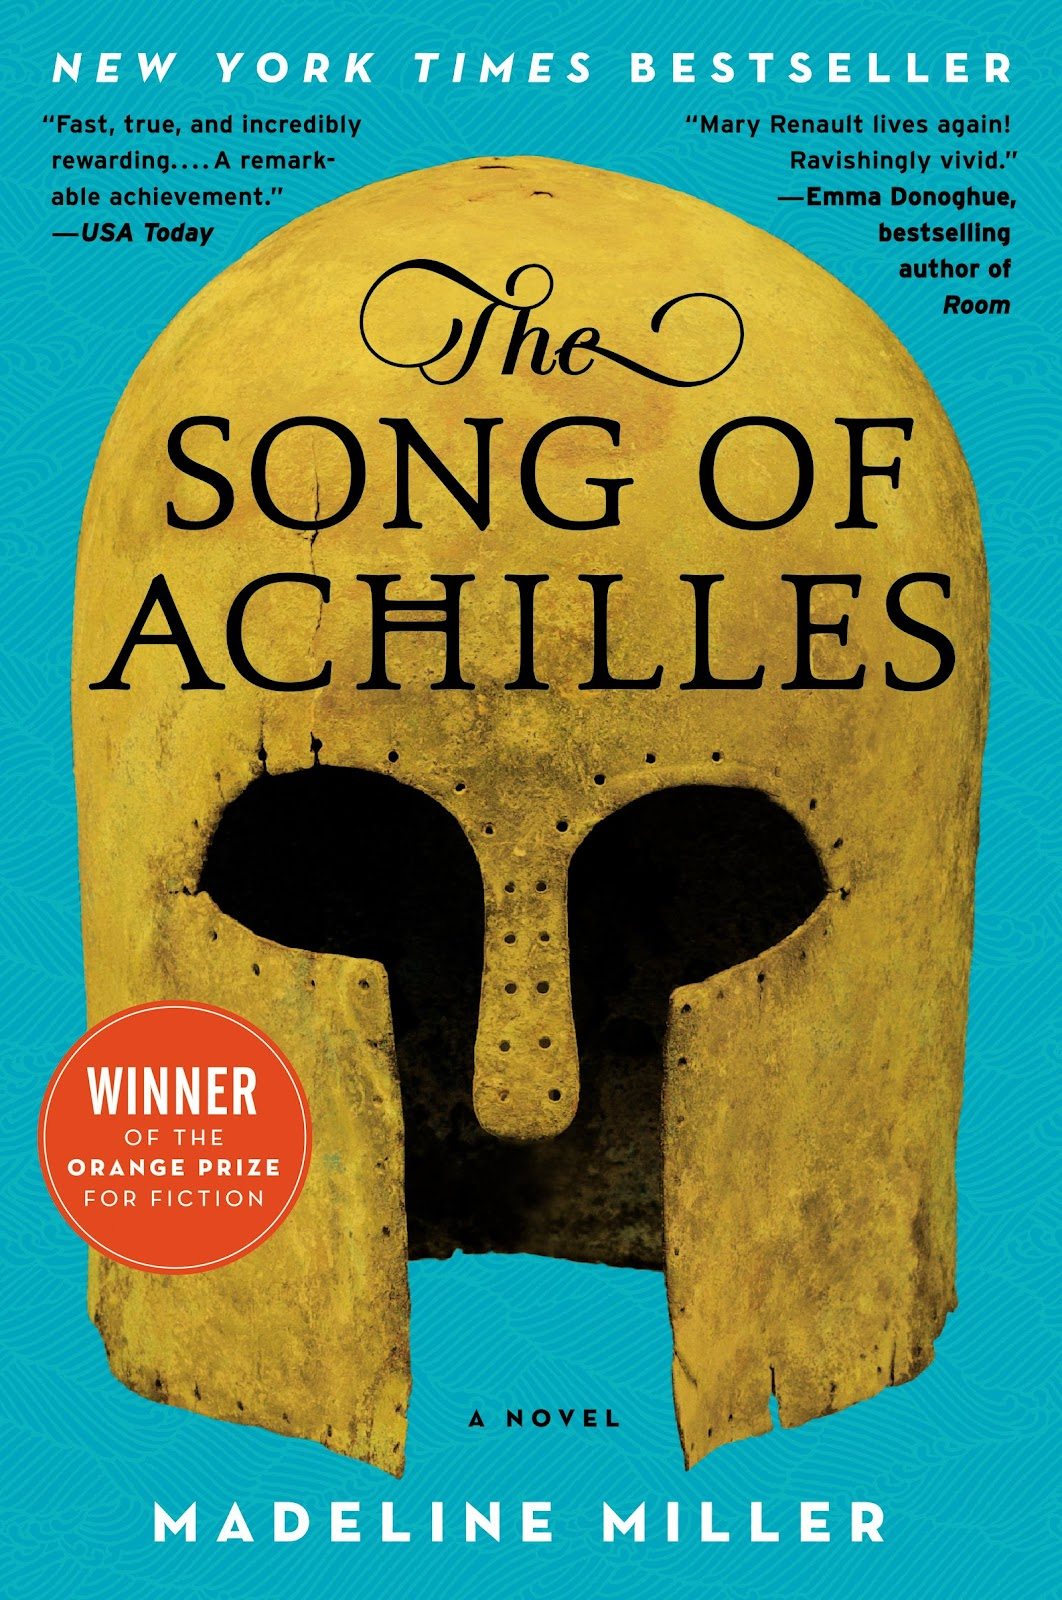 The Song of Achilles: A Novel: Miller, Madeline: 9780062060624: Amazon.com:  Books